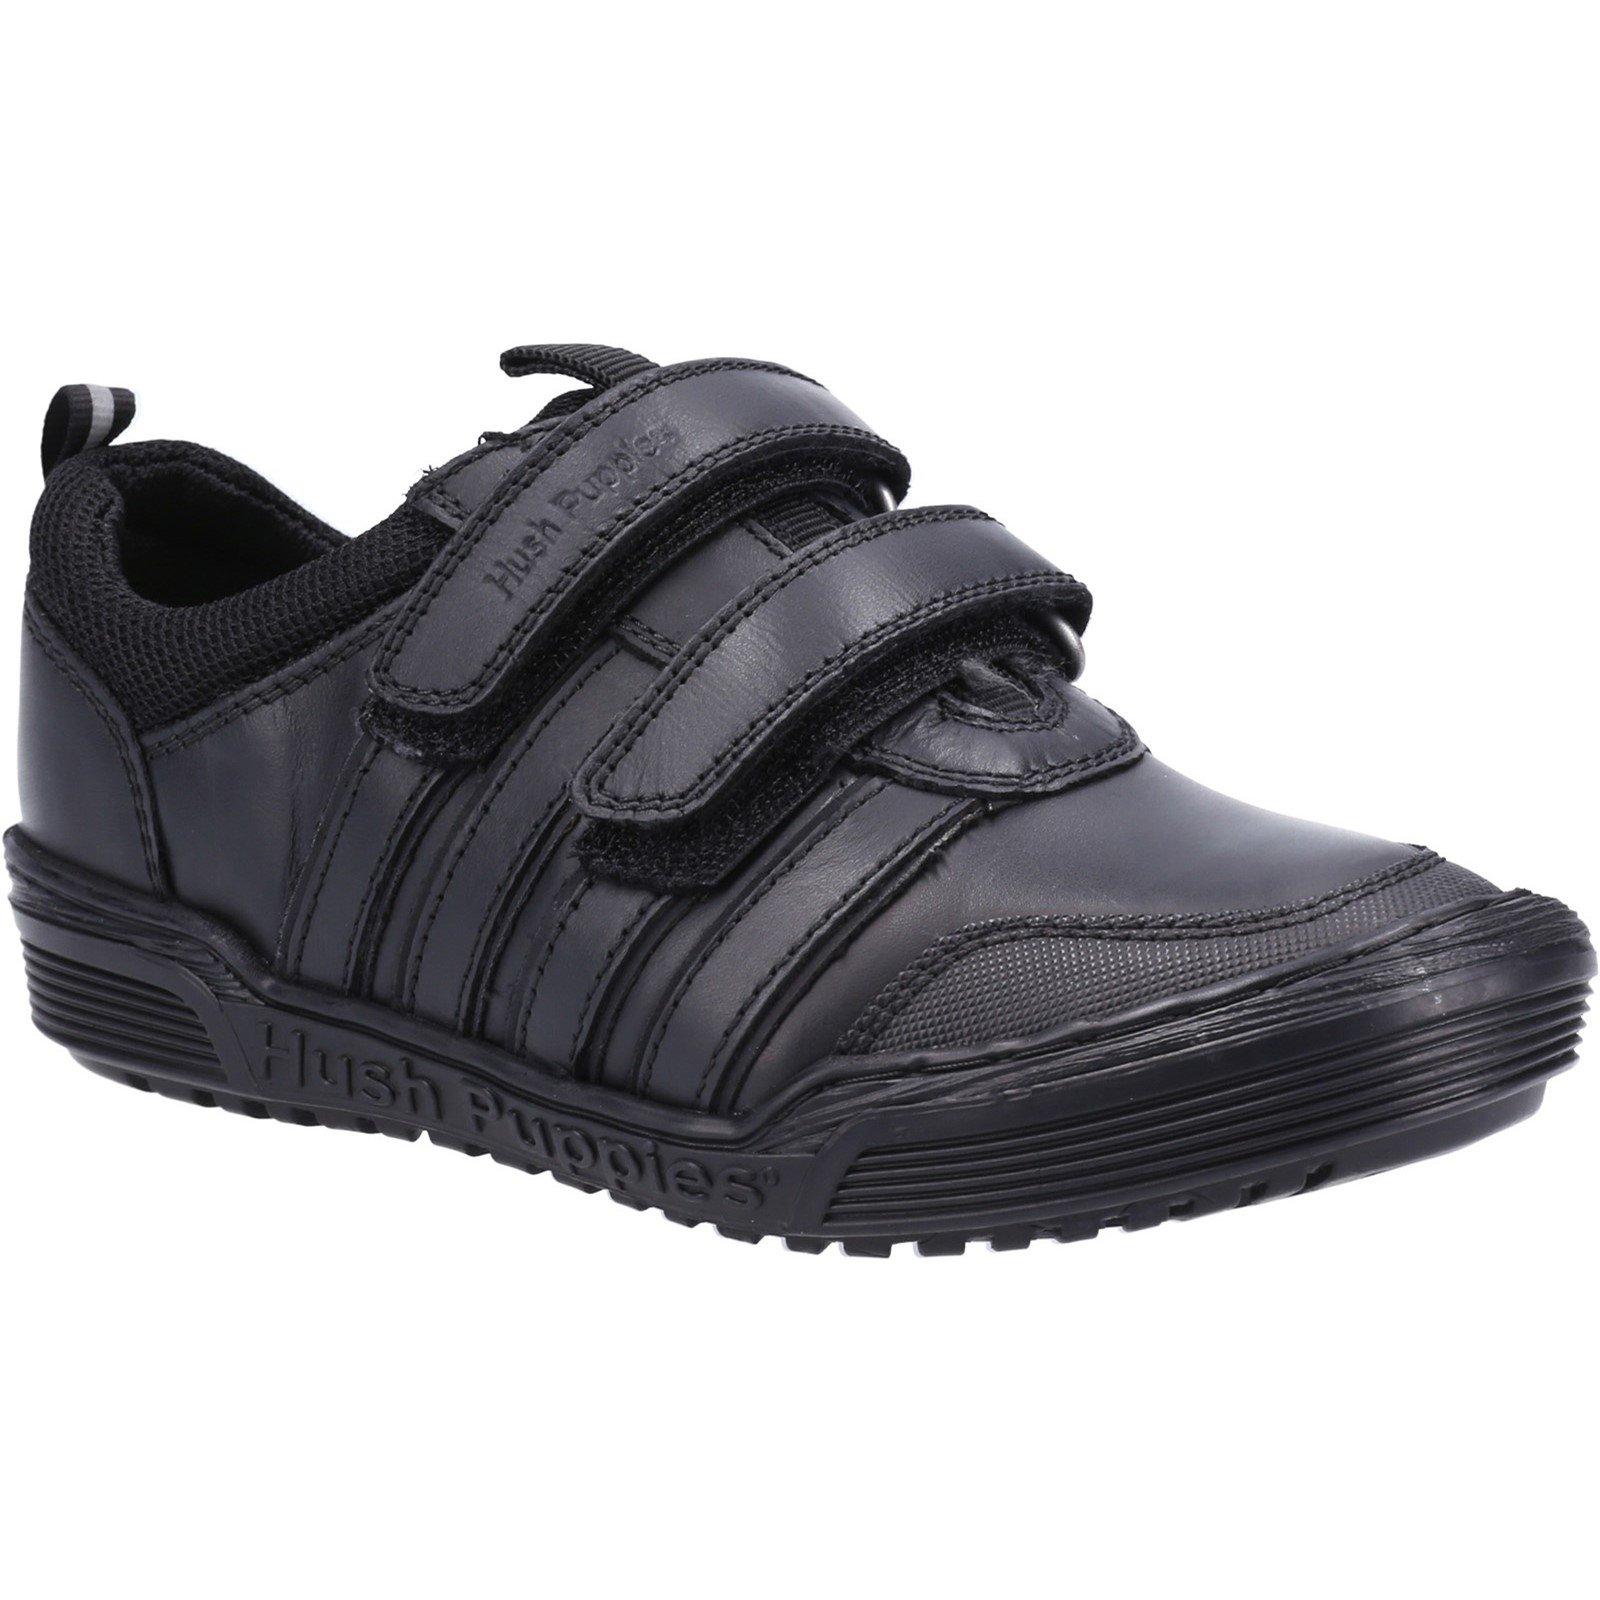 Hush Puppies Kid's Jake School Shoe Black 32736 - Black 11